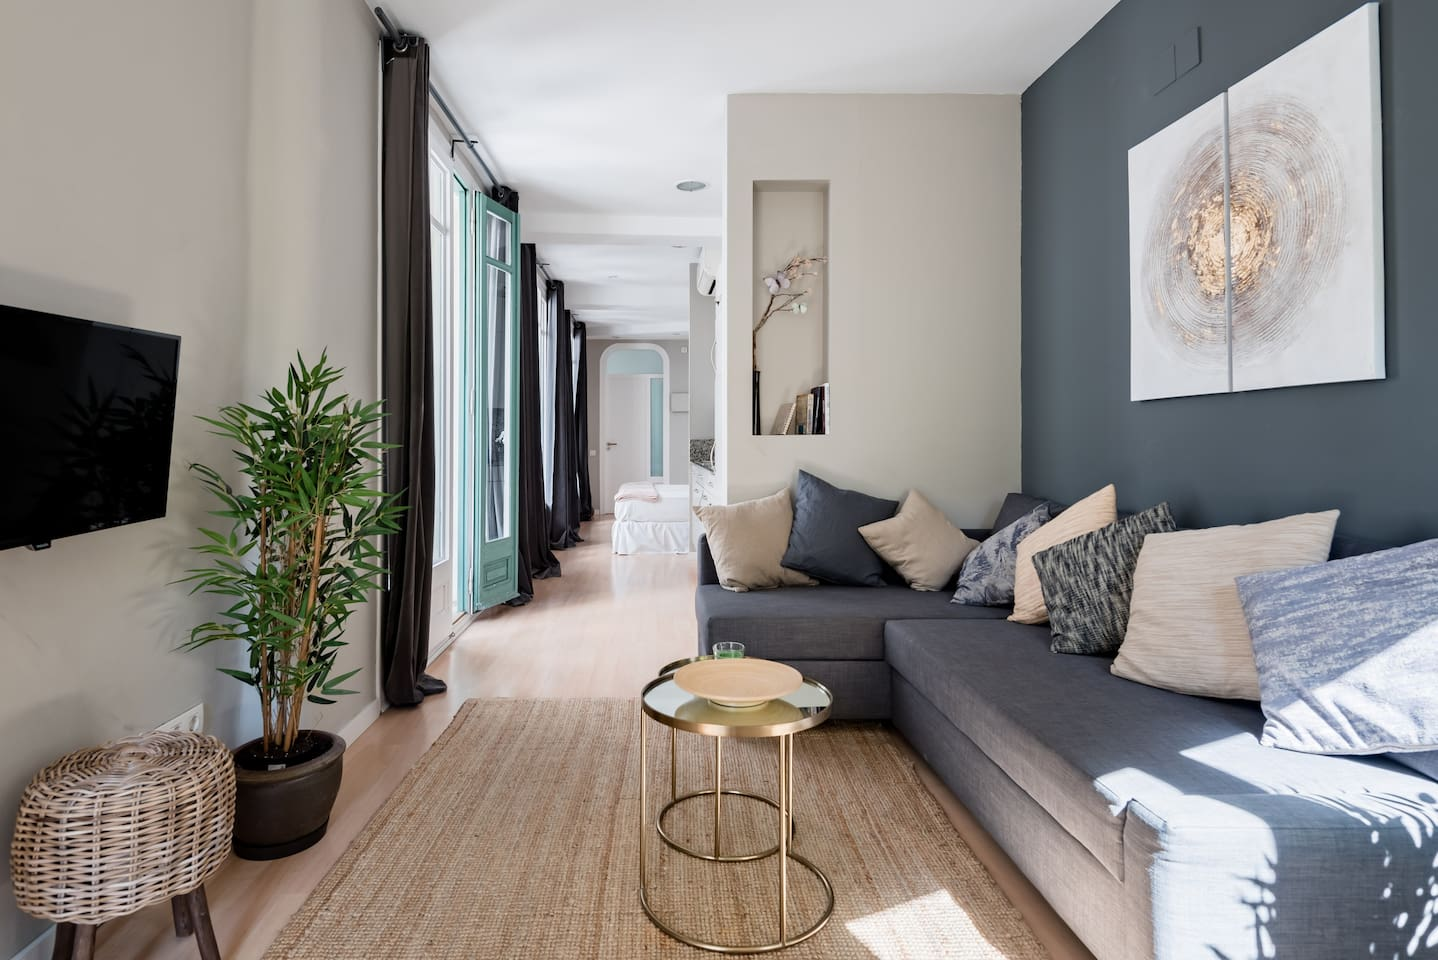 Luxury Airbnb Barcelona